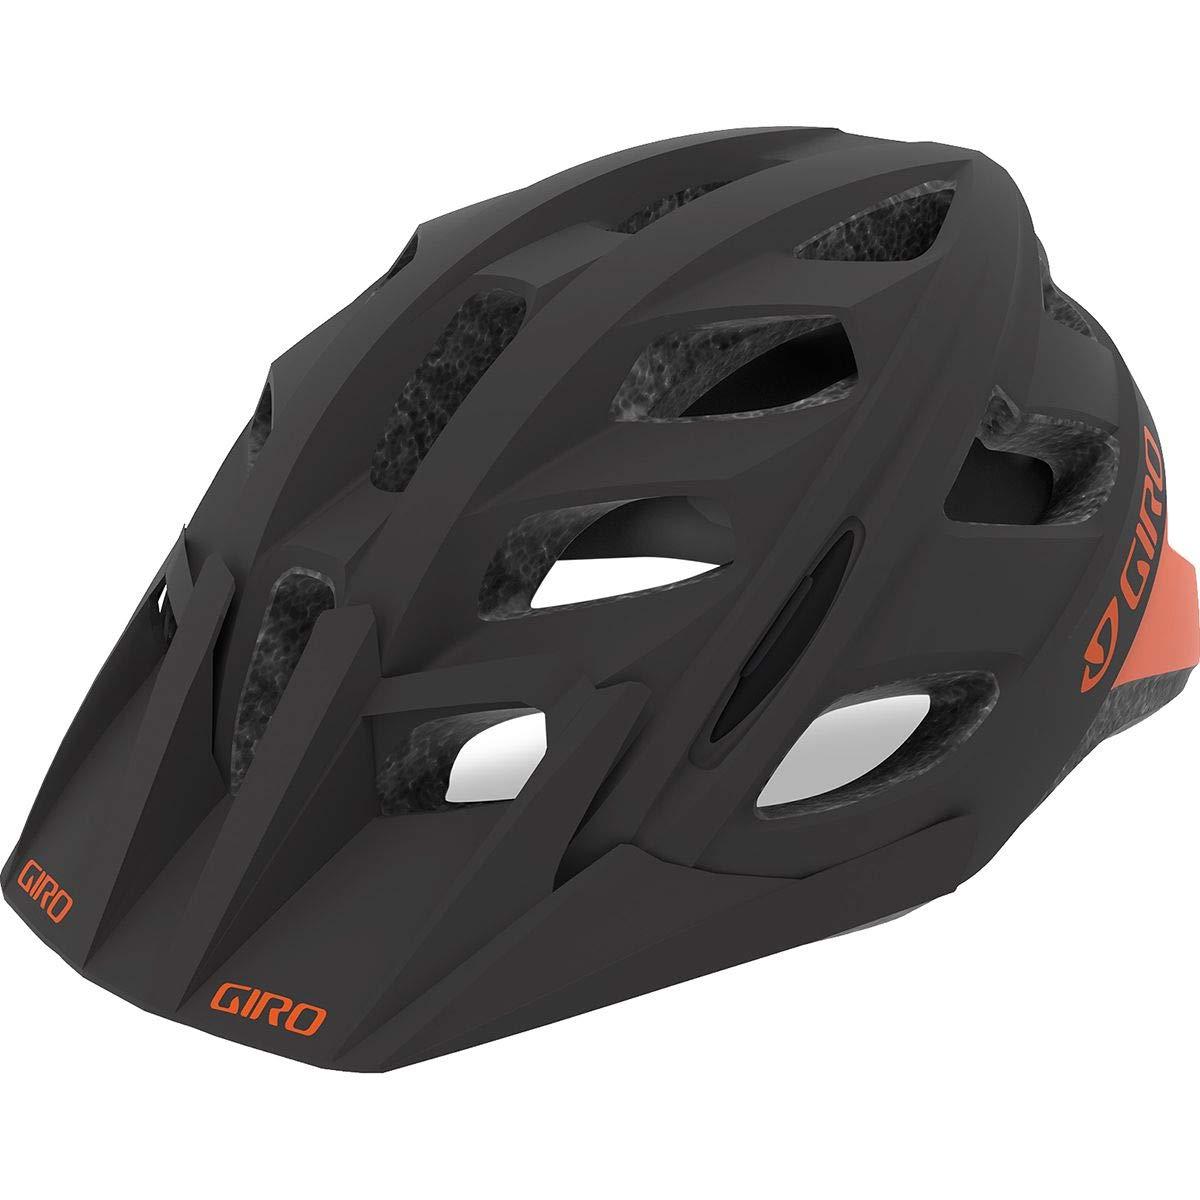 Giro Hex MTB Fahrrad Helm schwarz Orange 2019